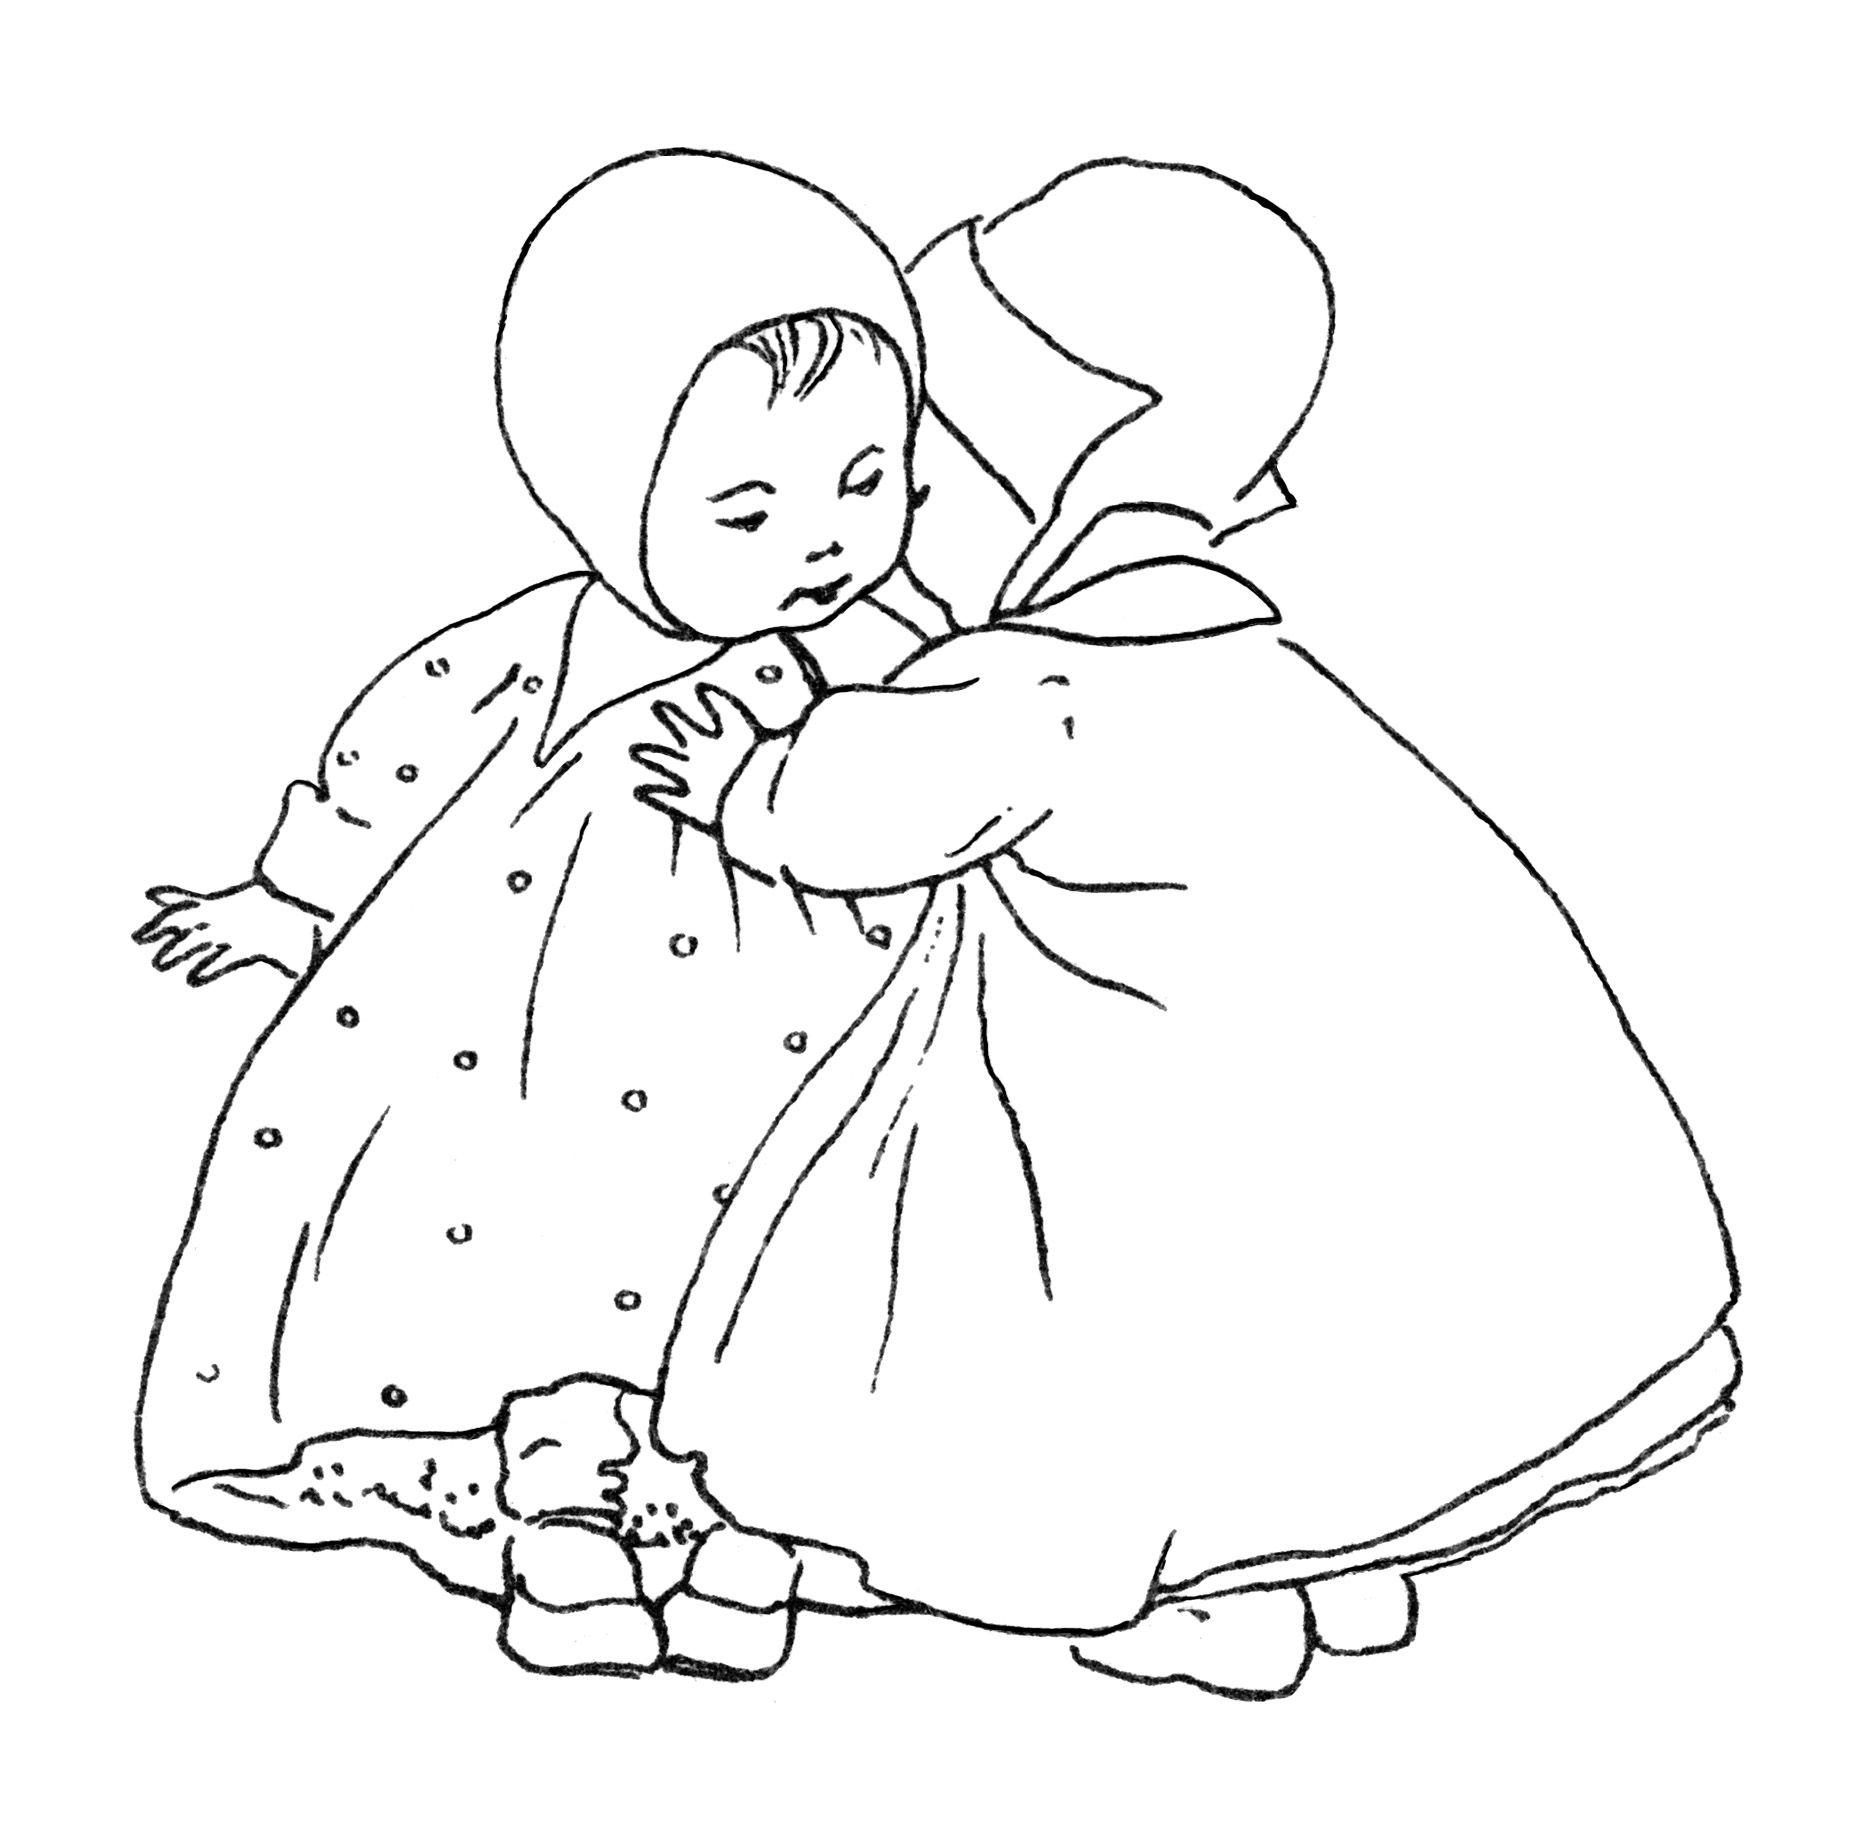 Baby Clip Art Black And White Clipart Vintage Children Image Baby Girl Illustration Little G Baby Clip Art Embroidery Designs Baby Embroidery And Stitching